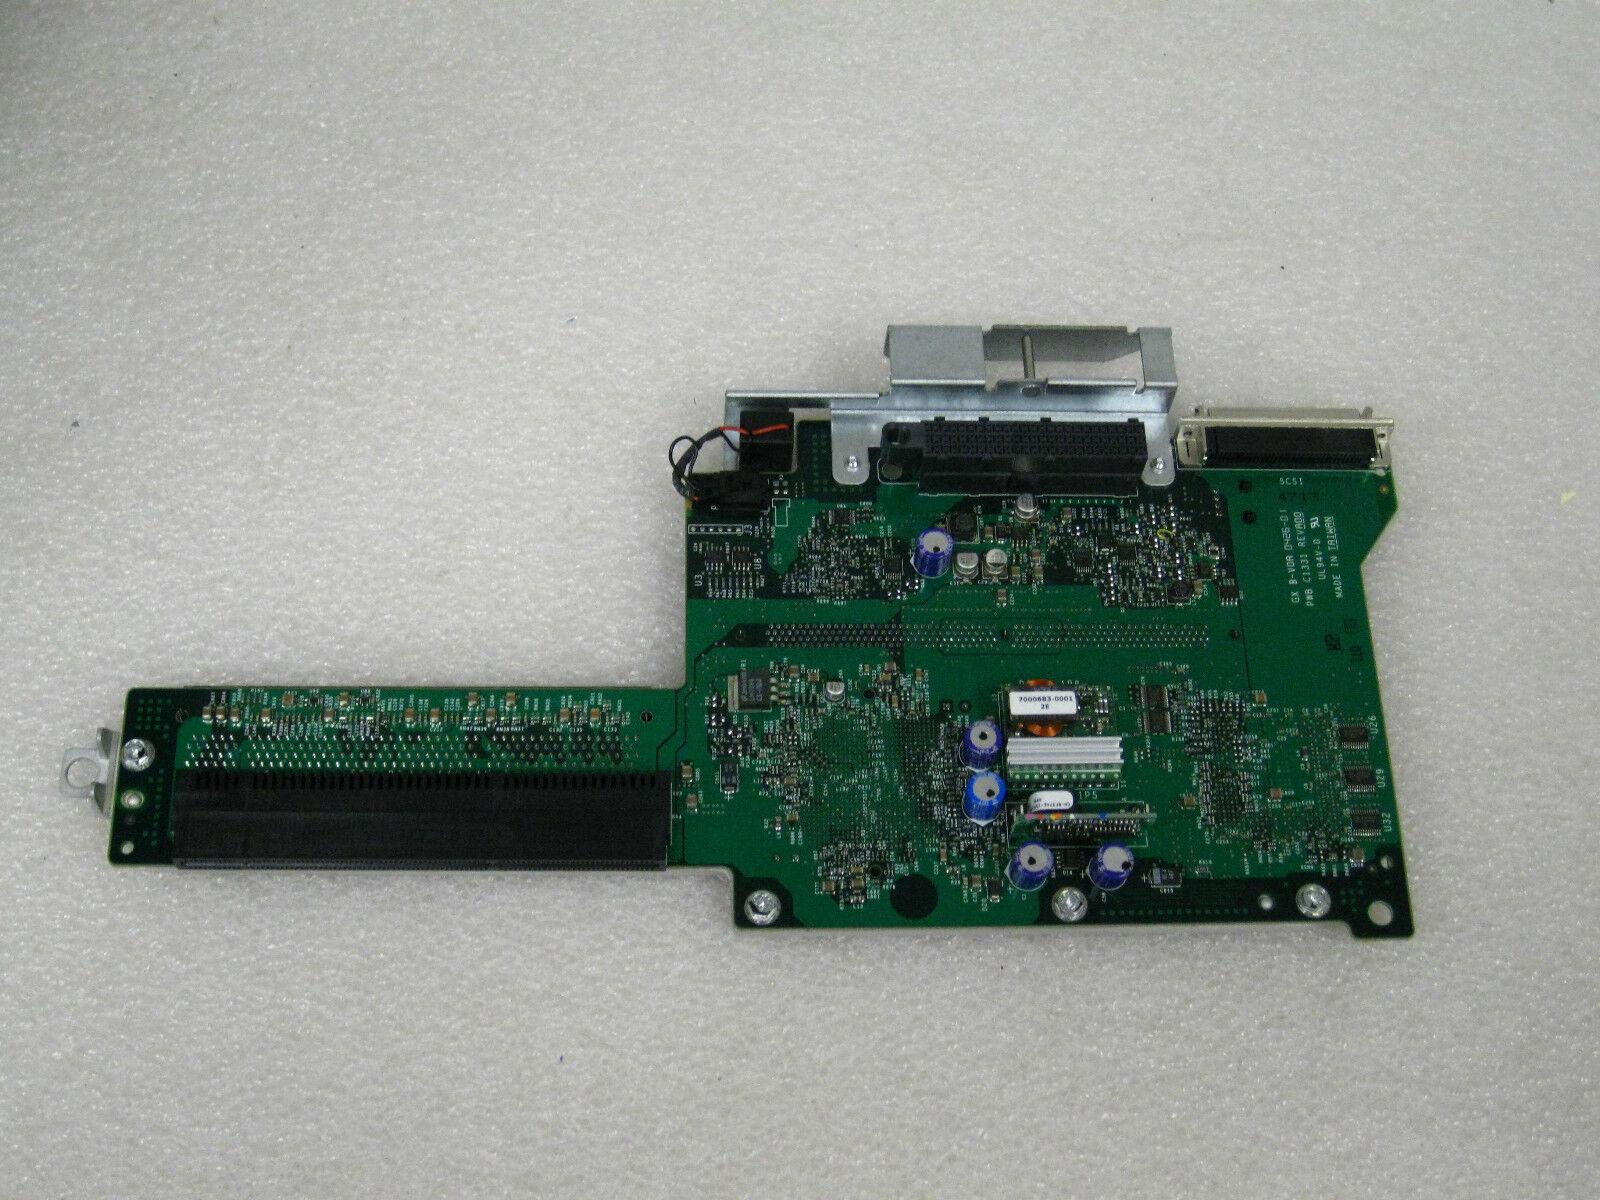 0w8228 Dell w8228 PowerEdge 1850 ROMB RAID RISER CARD BOARD Backplane PCI-X